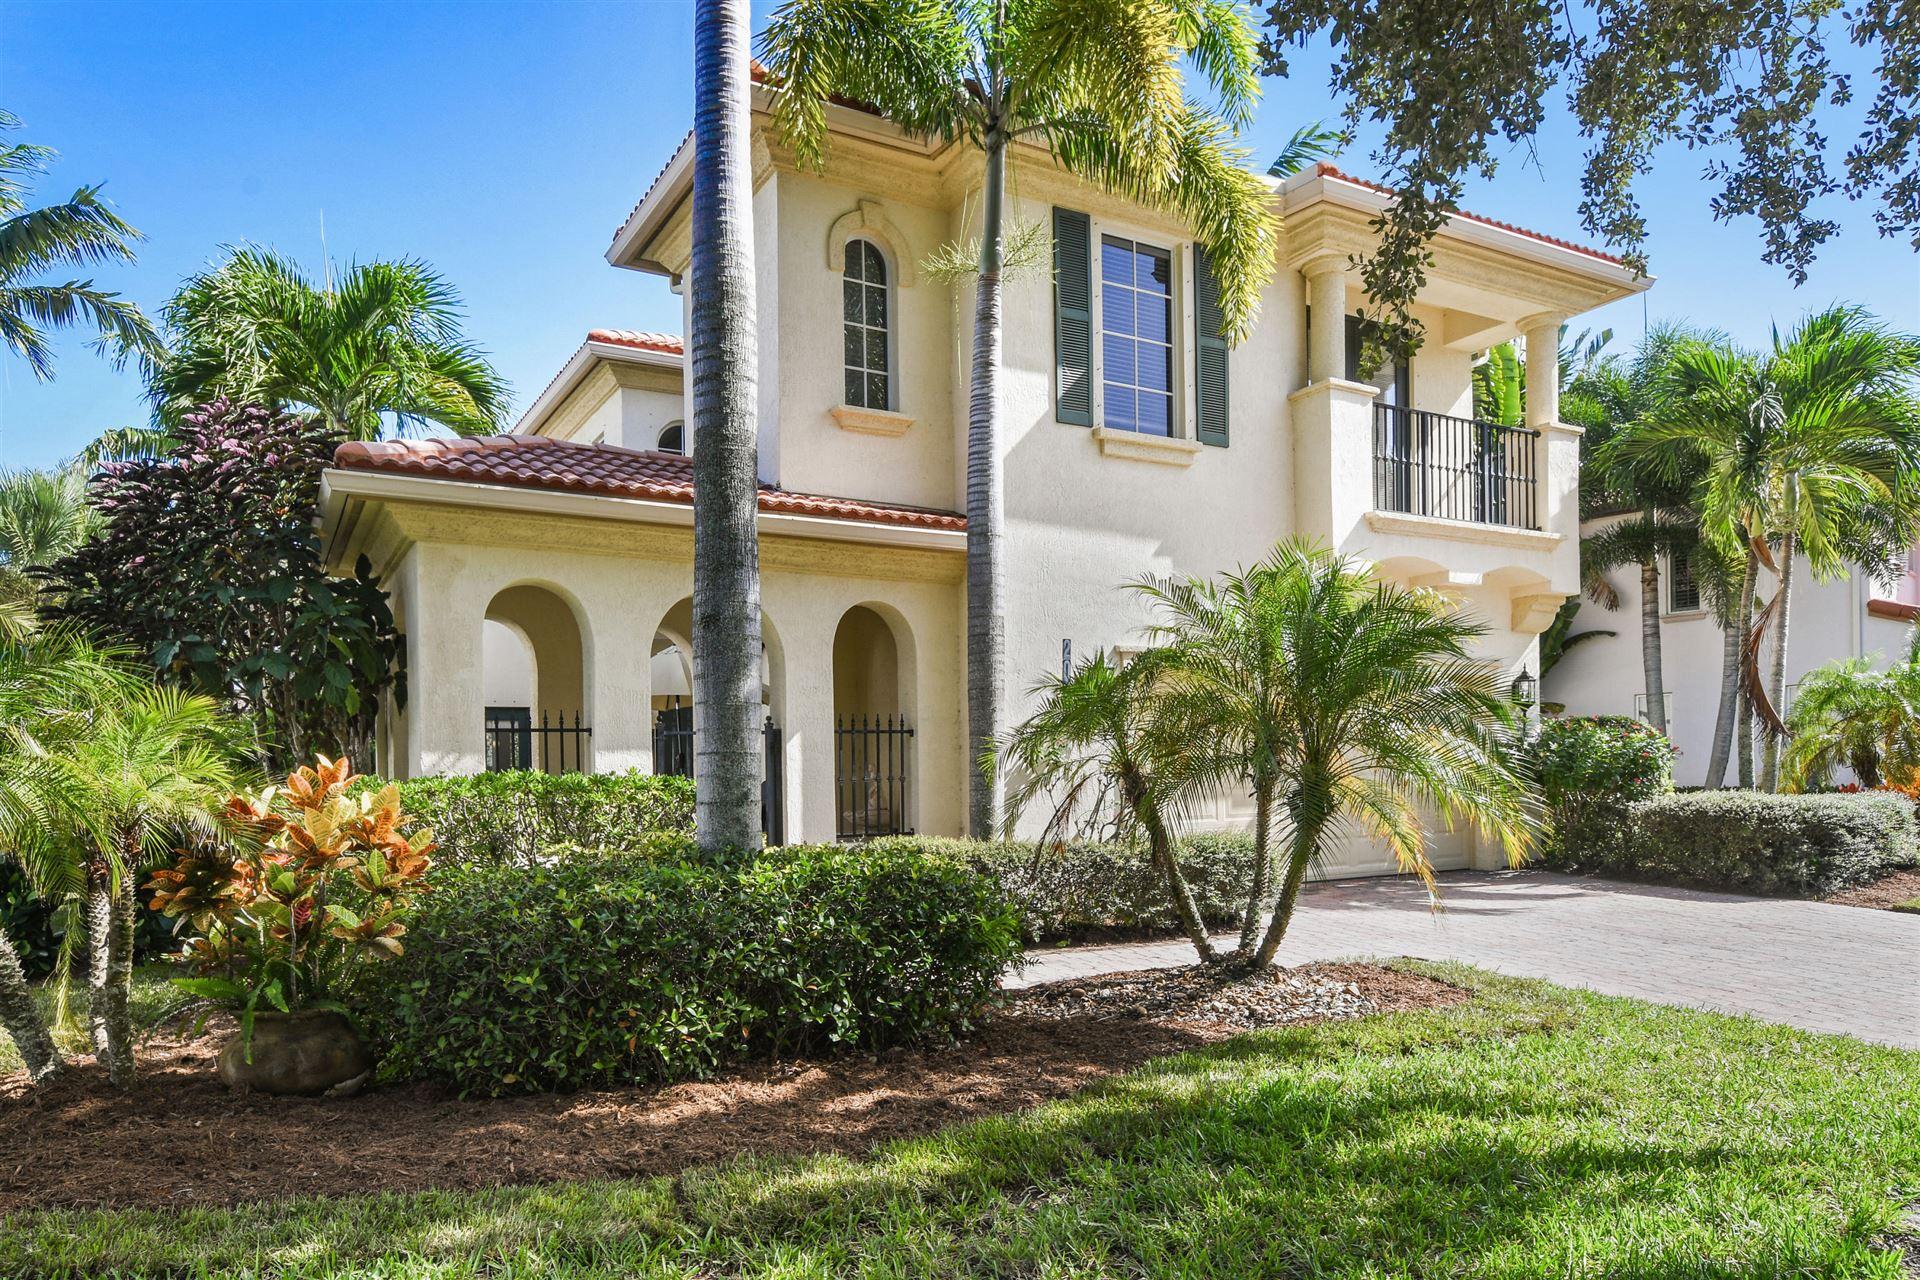 2012 Graden Dr Drive, Palm Beach Gardens, FL 33410 - #: RX-10643617